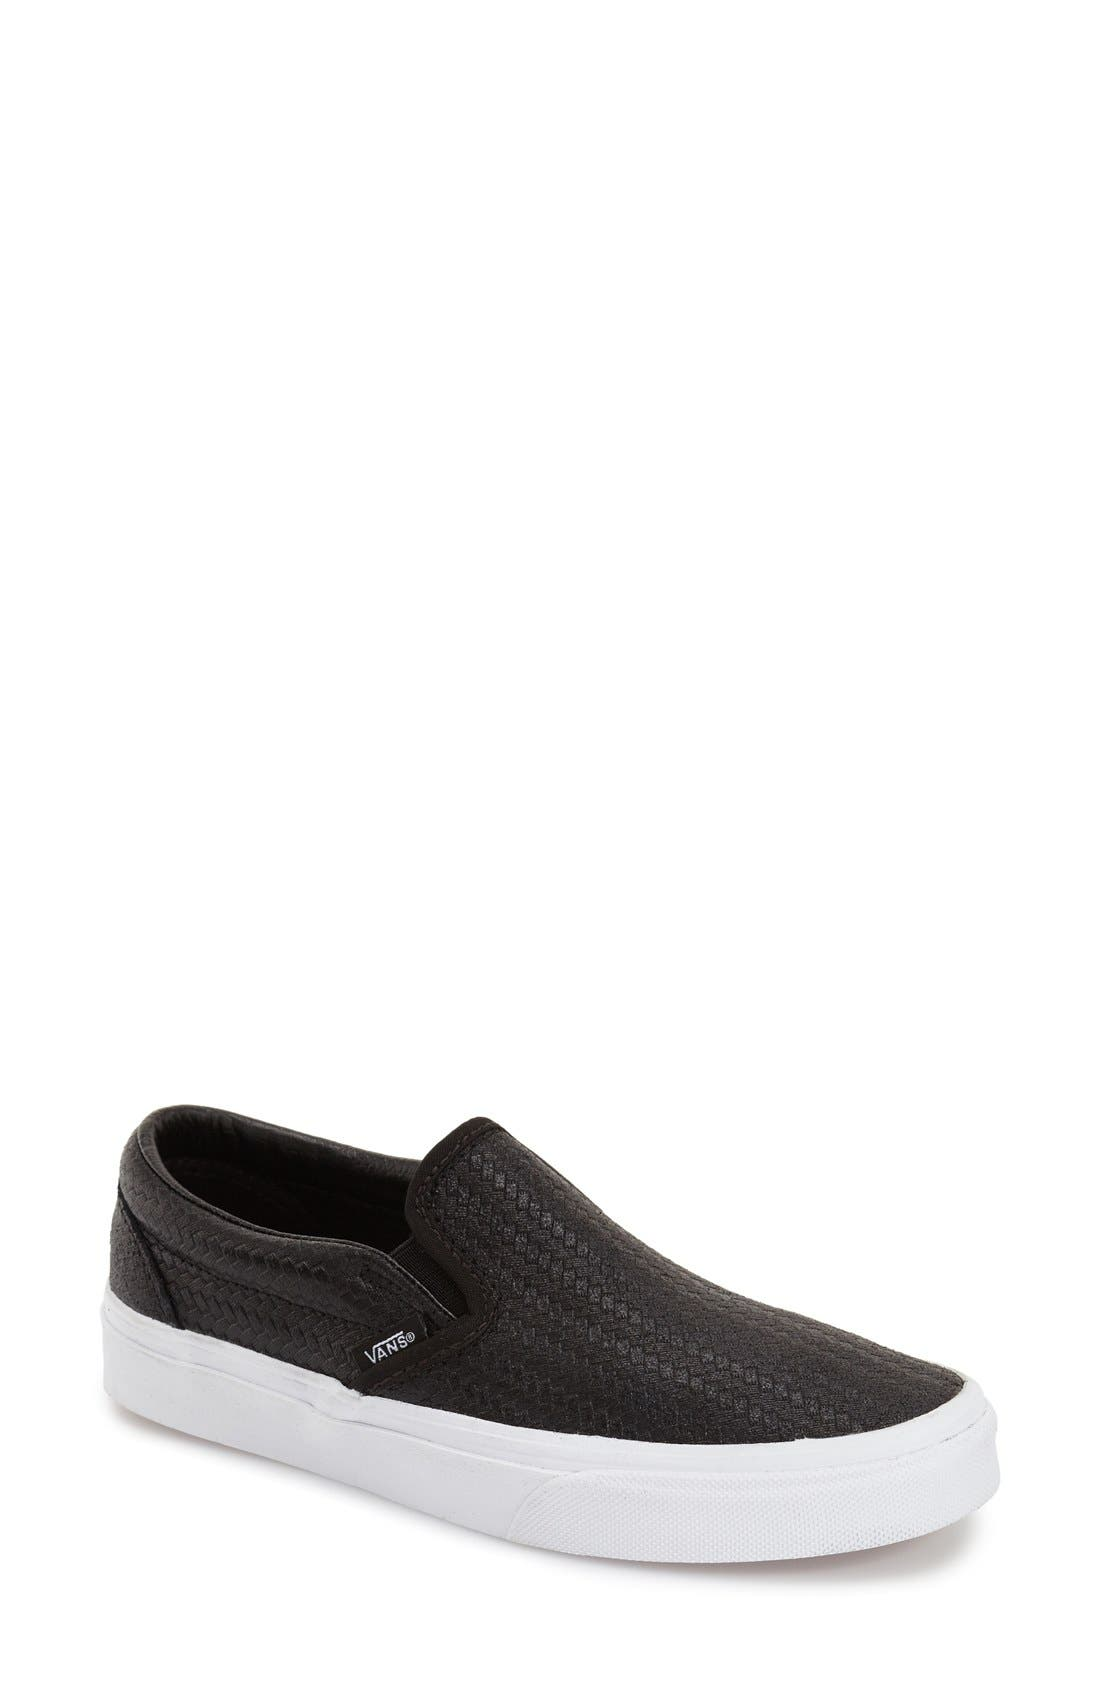 ,                             Classic Slip-On Sneaker,                             Main thumbnail 237, color,                             001